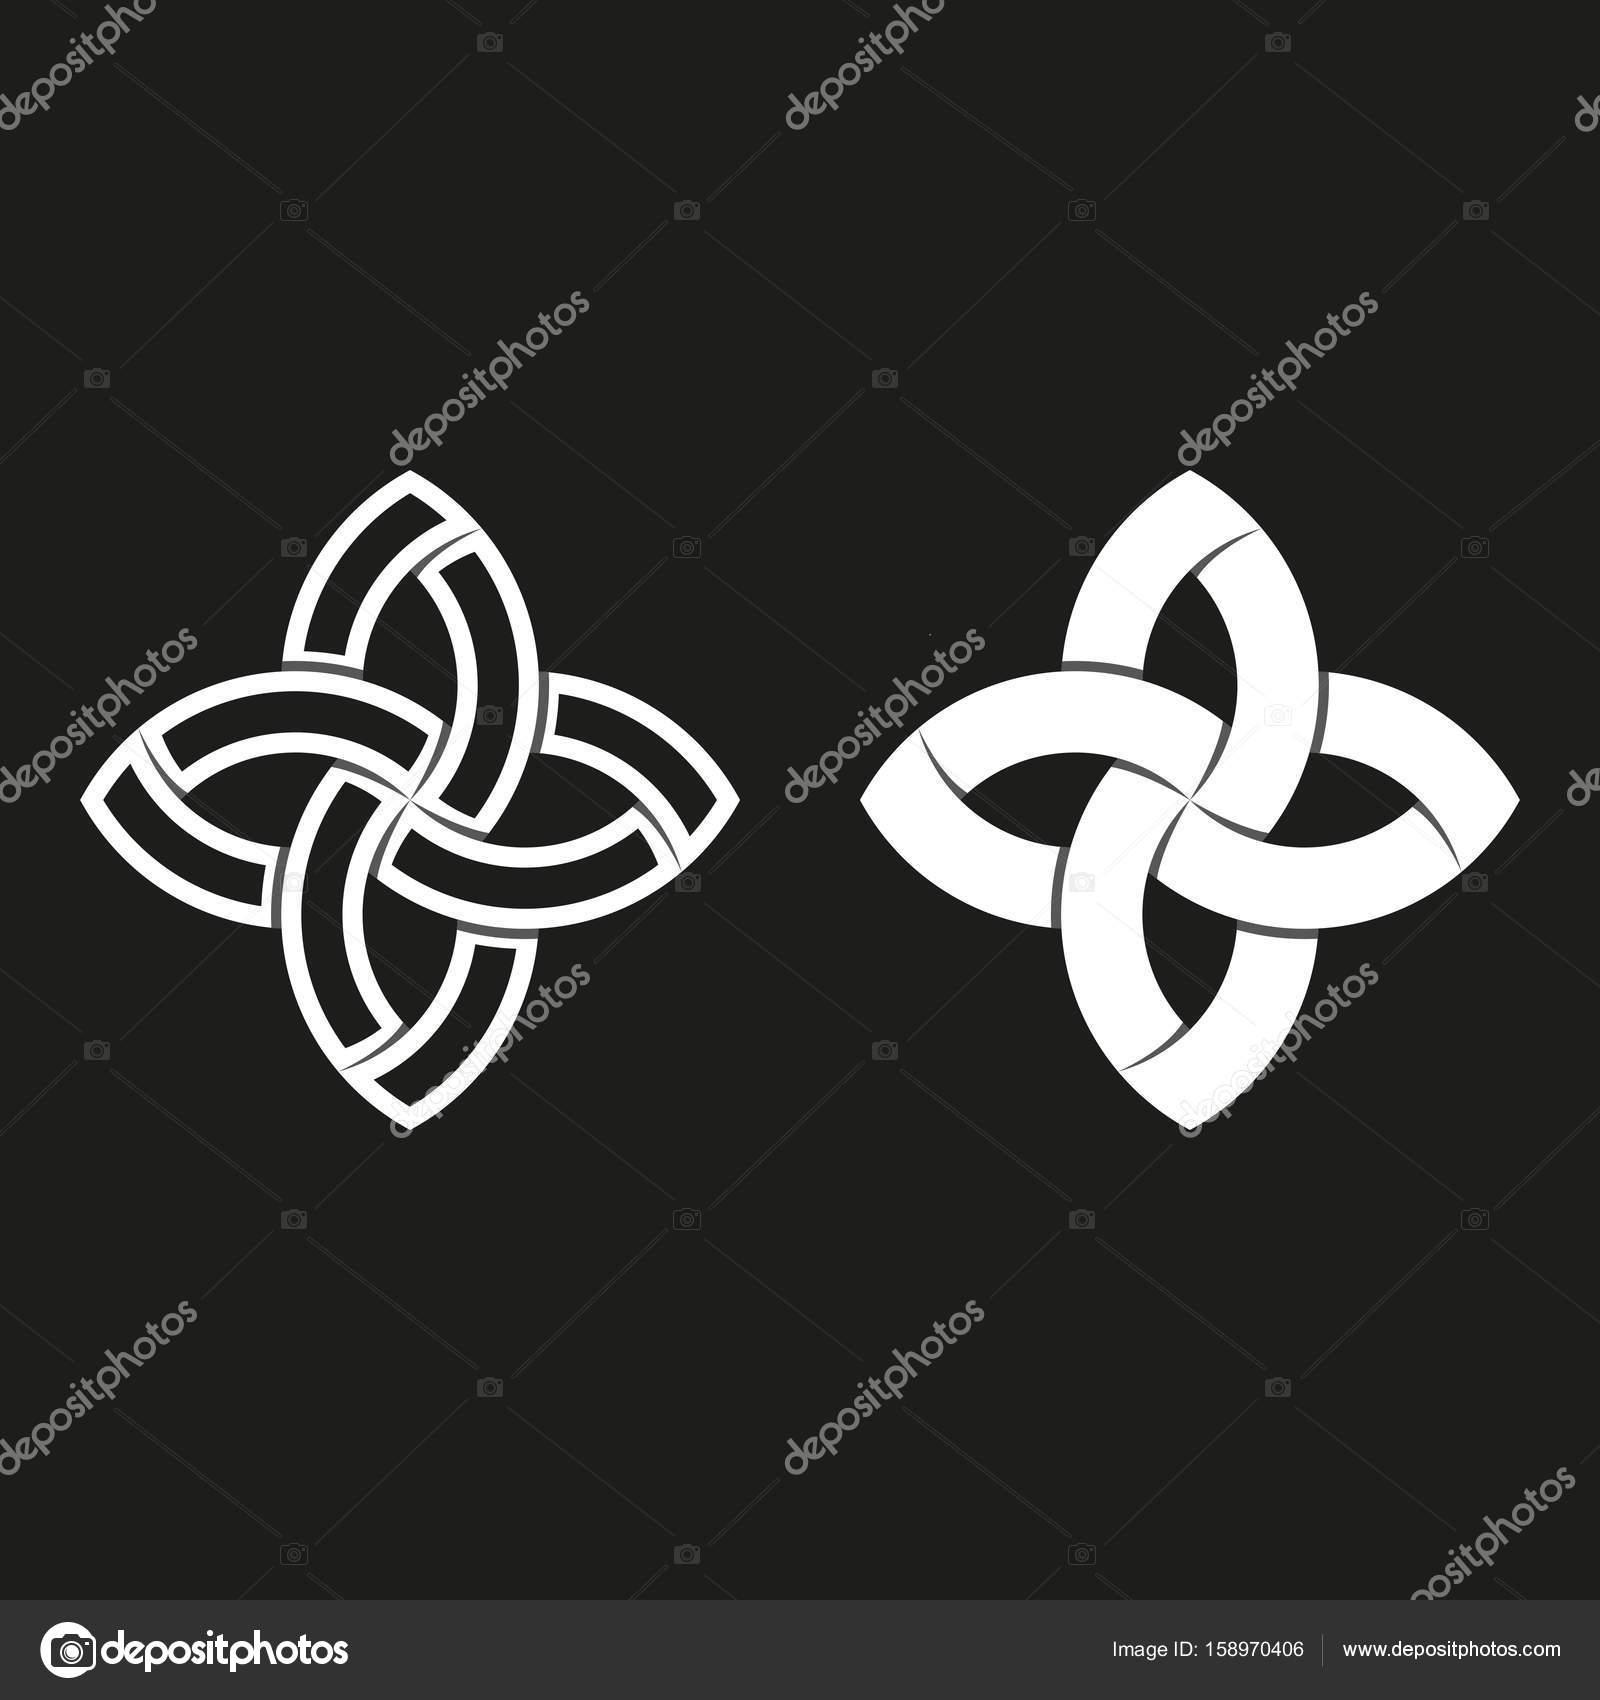 Sacred geometric logo black and white overlapping paper stripes weaving symmetry geometric shape meditation symbol feminine emblem vector by uasumy biocorpaavc Images